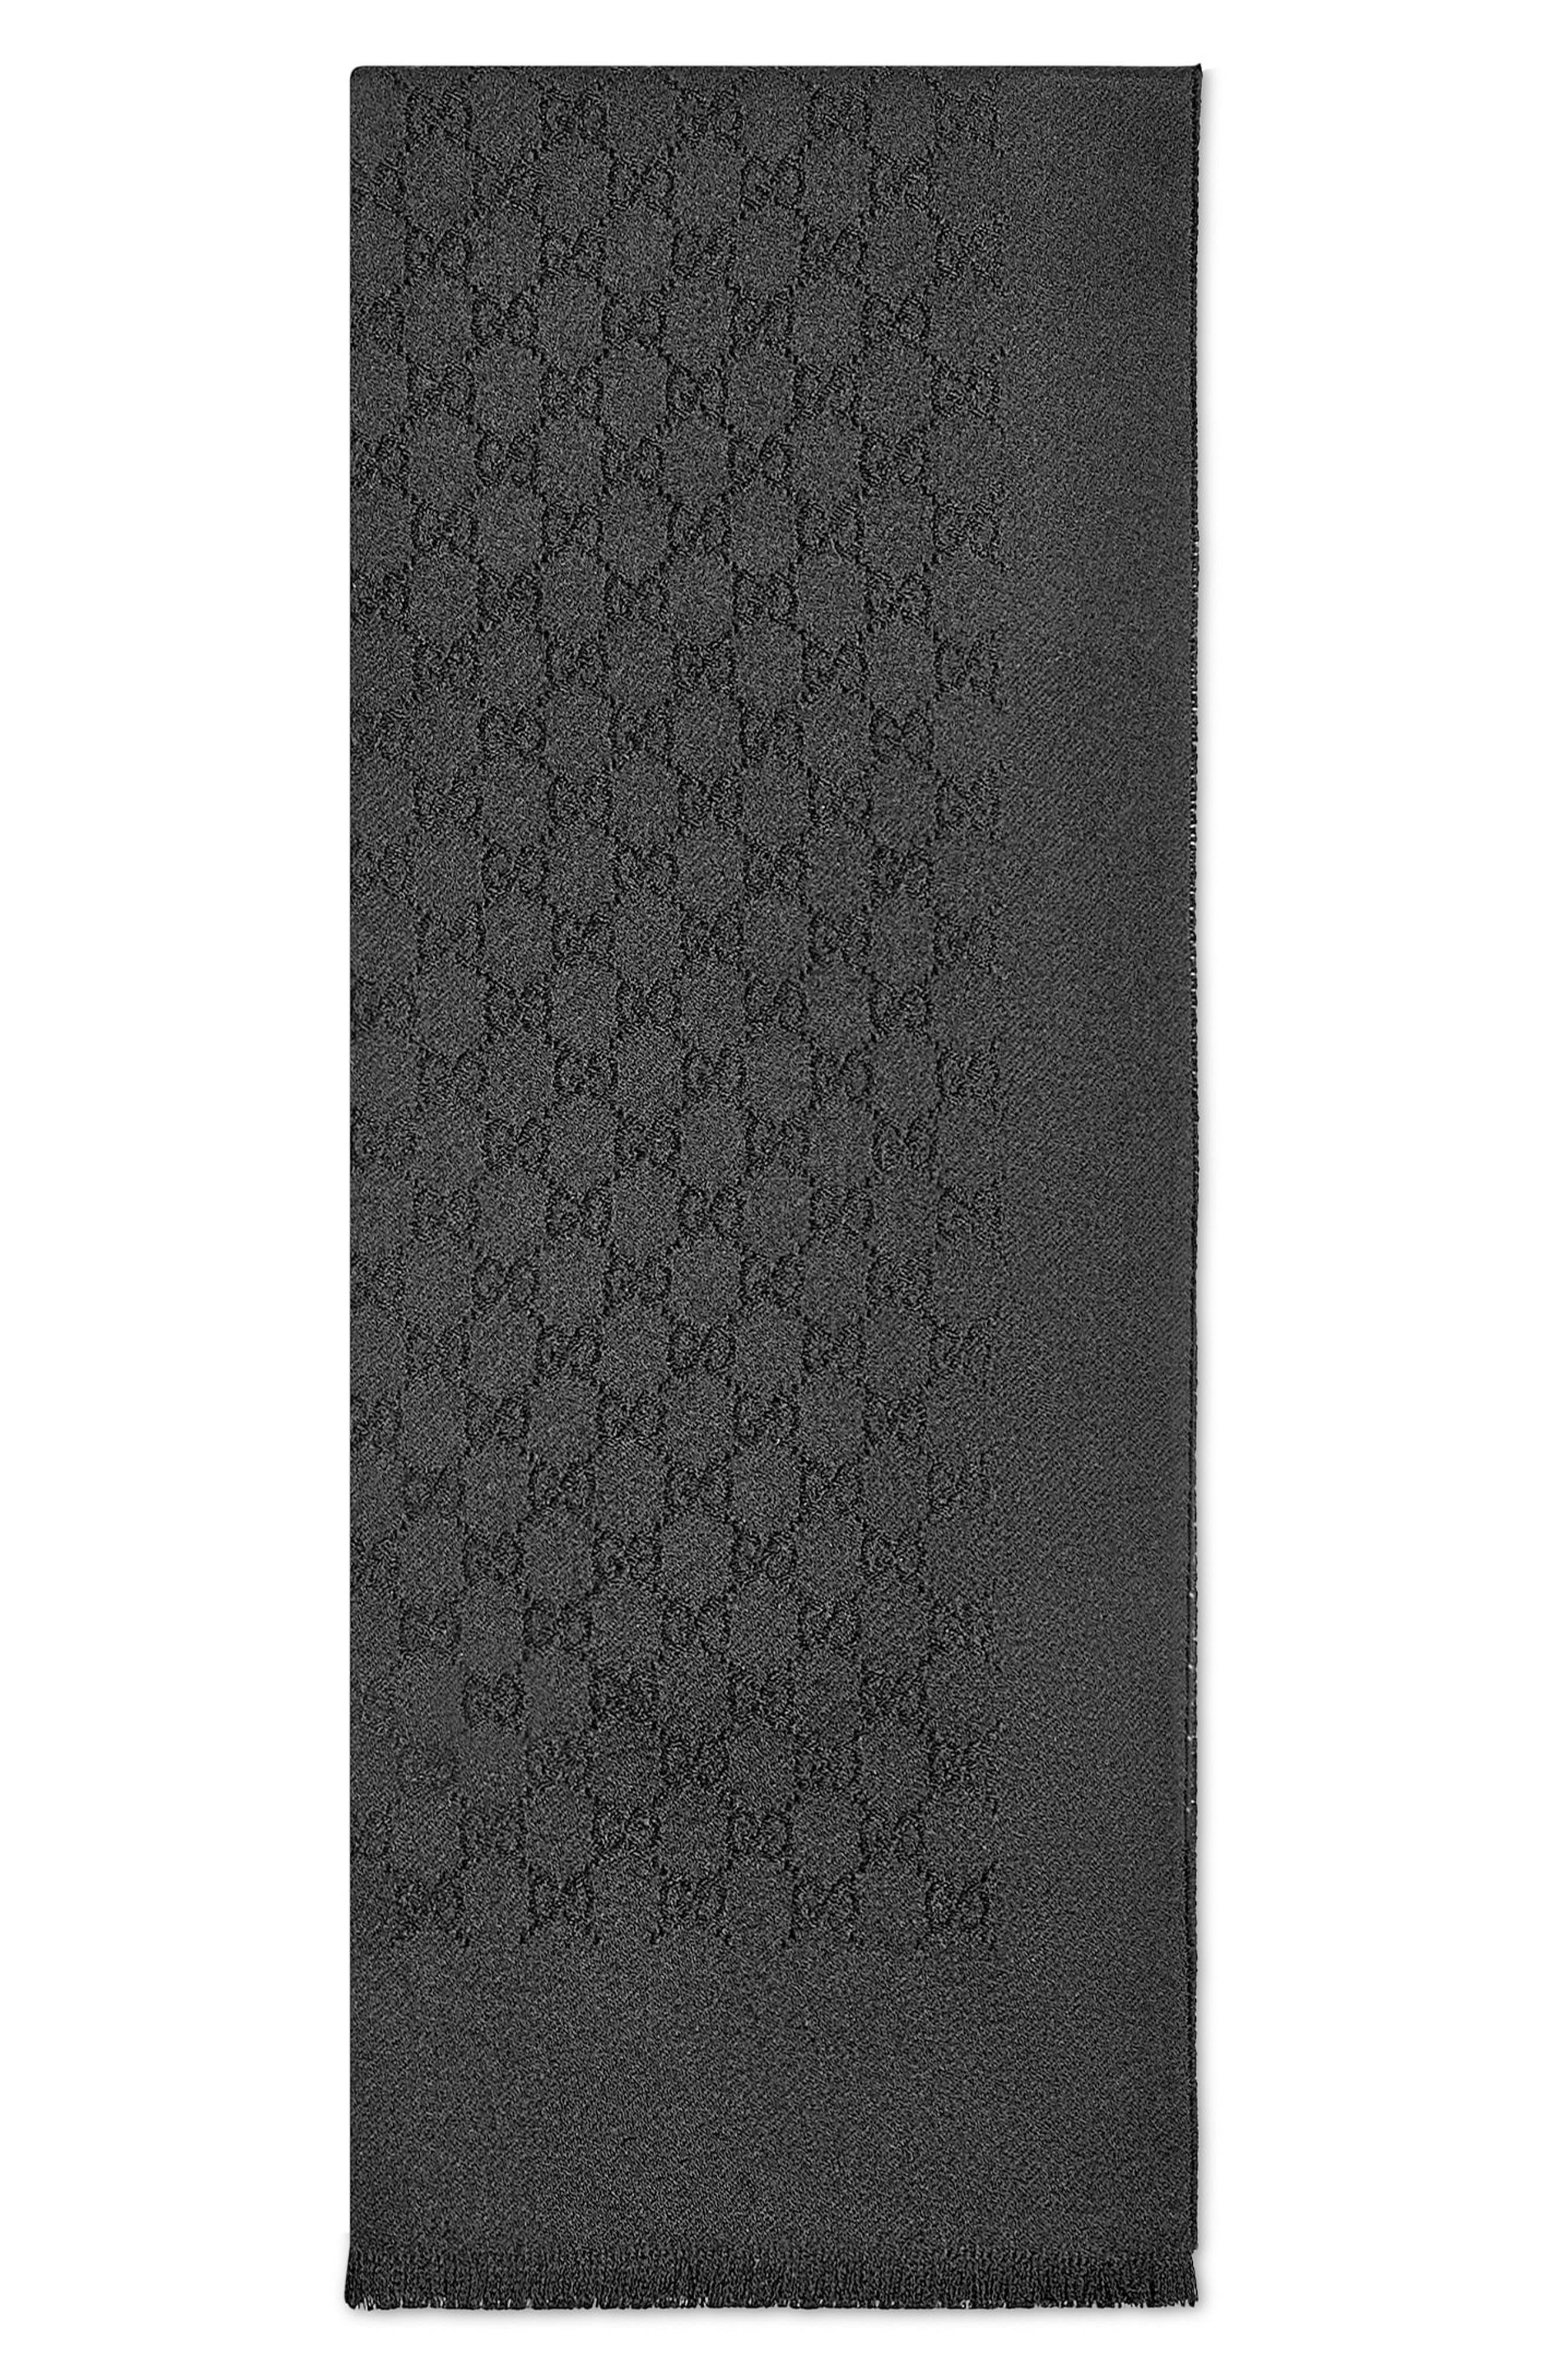 GG Gem Lux Jacquard Cashmere Scarf,                         Main,                         color, 002